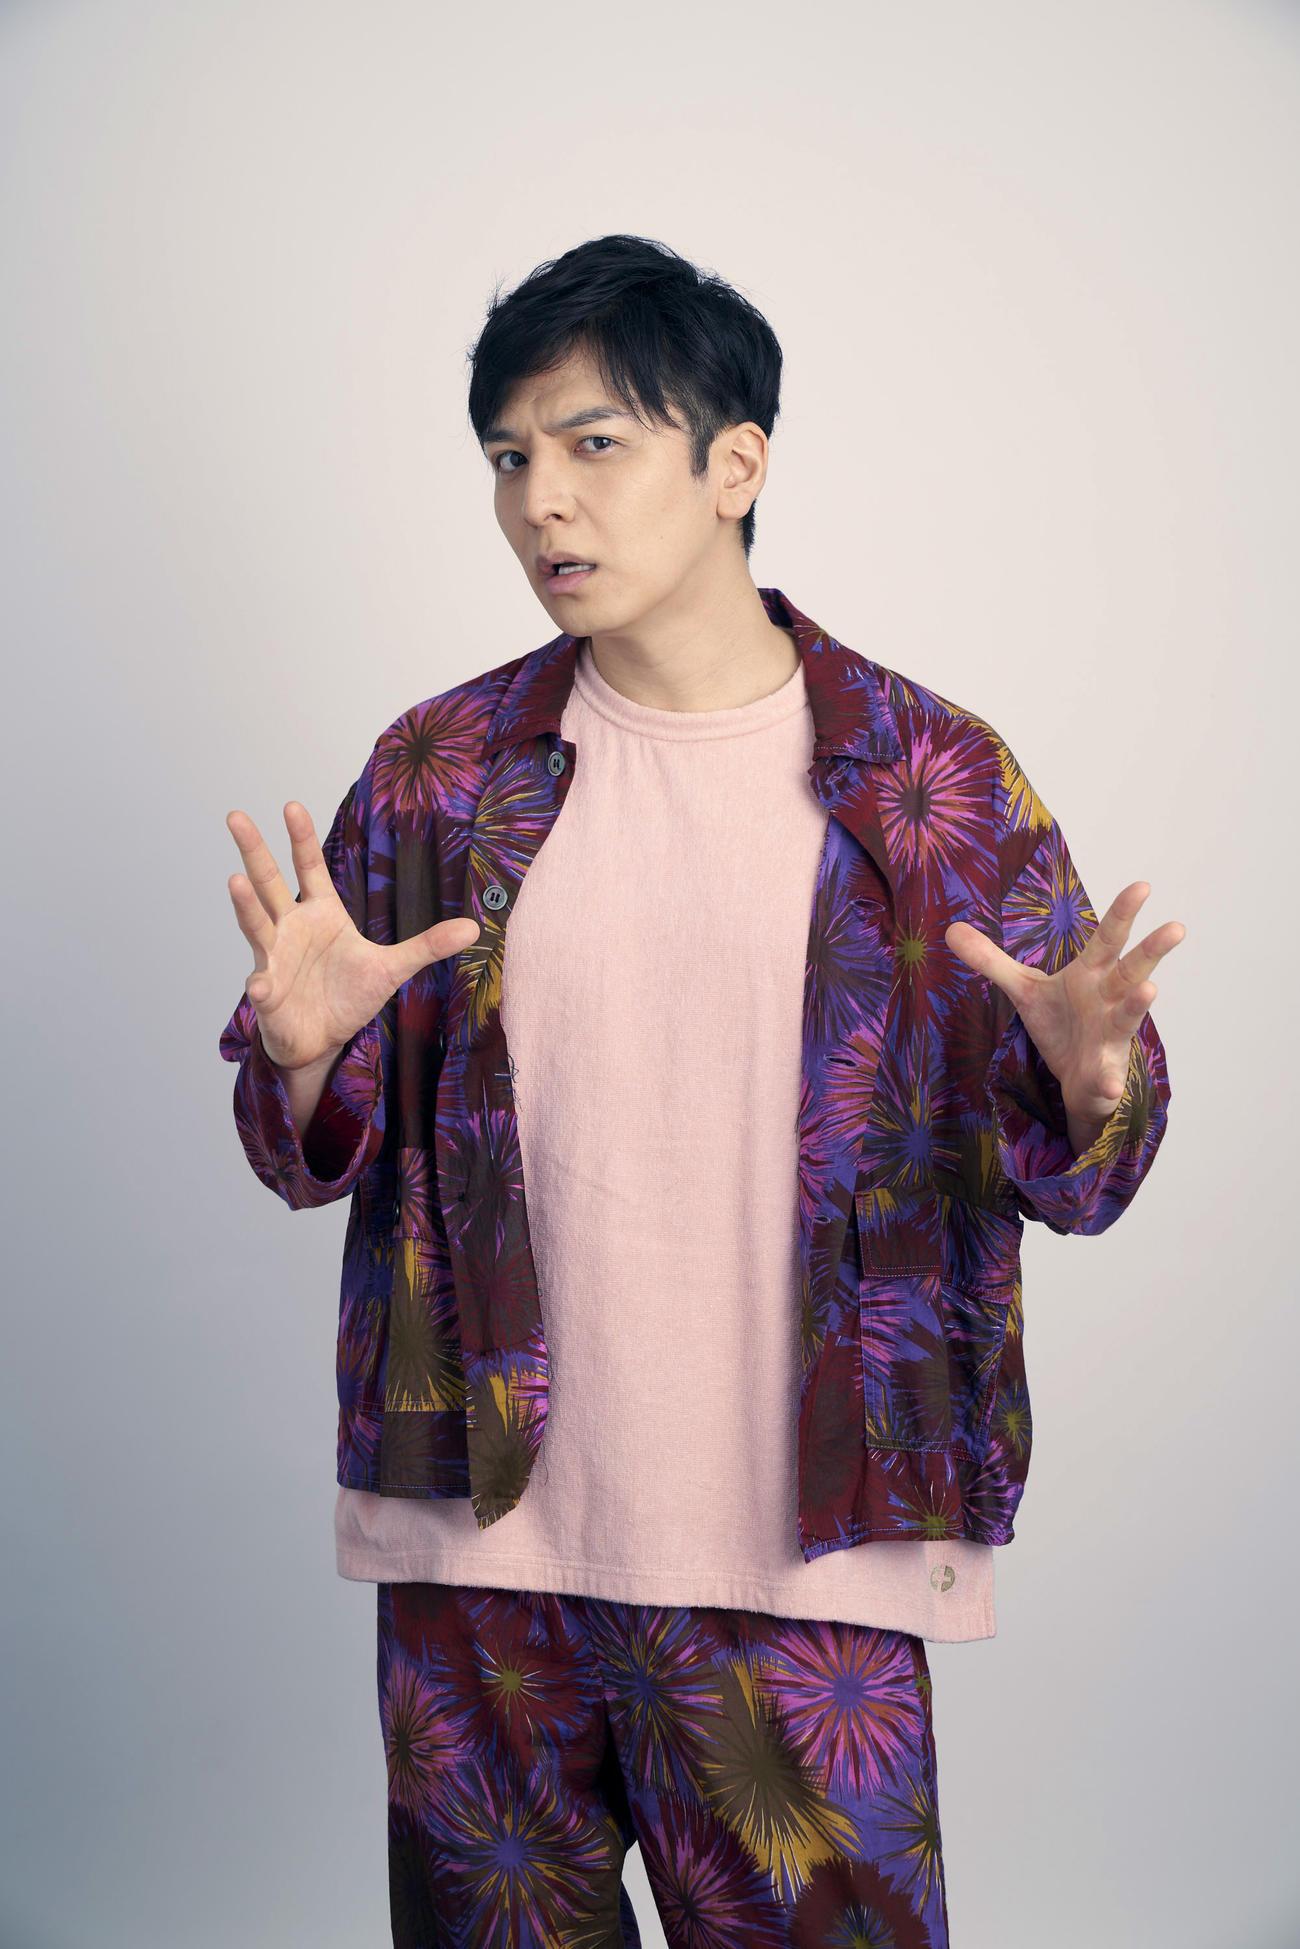 NHKドラマ「JOKE~2022 パニック配信」に主演する生田斗真